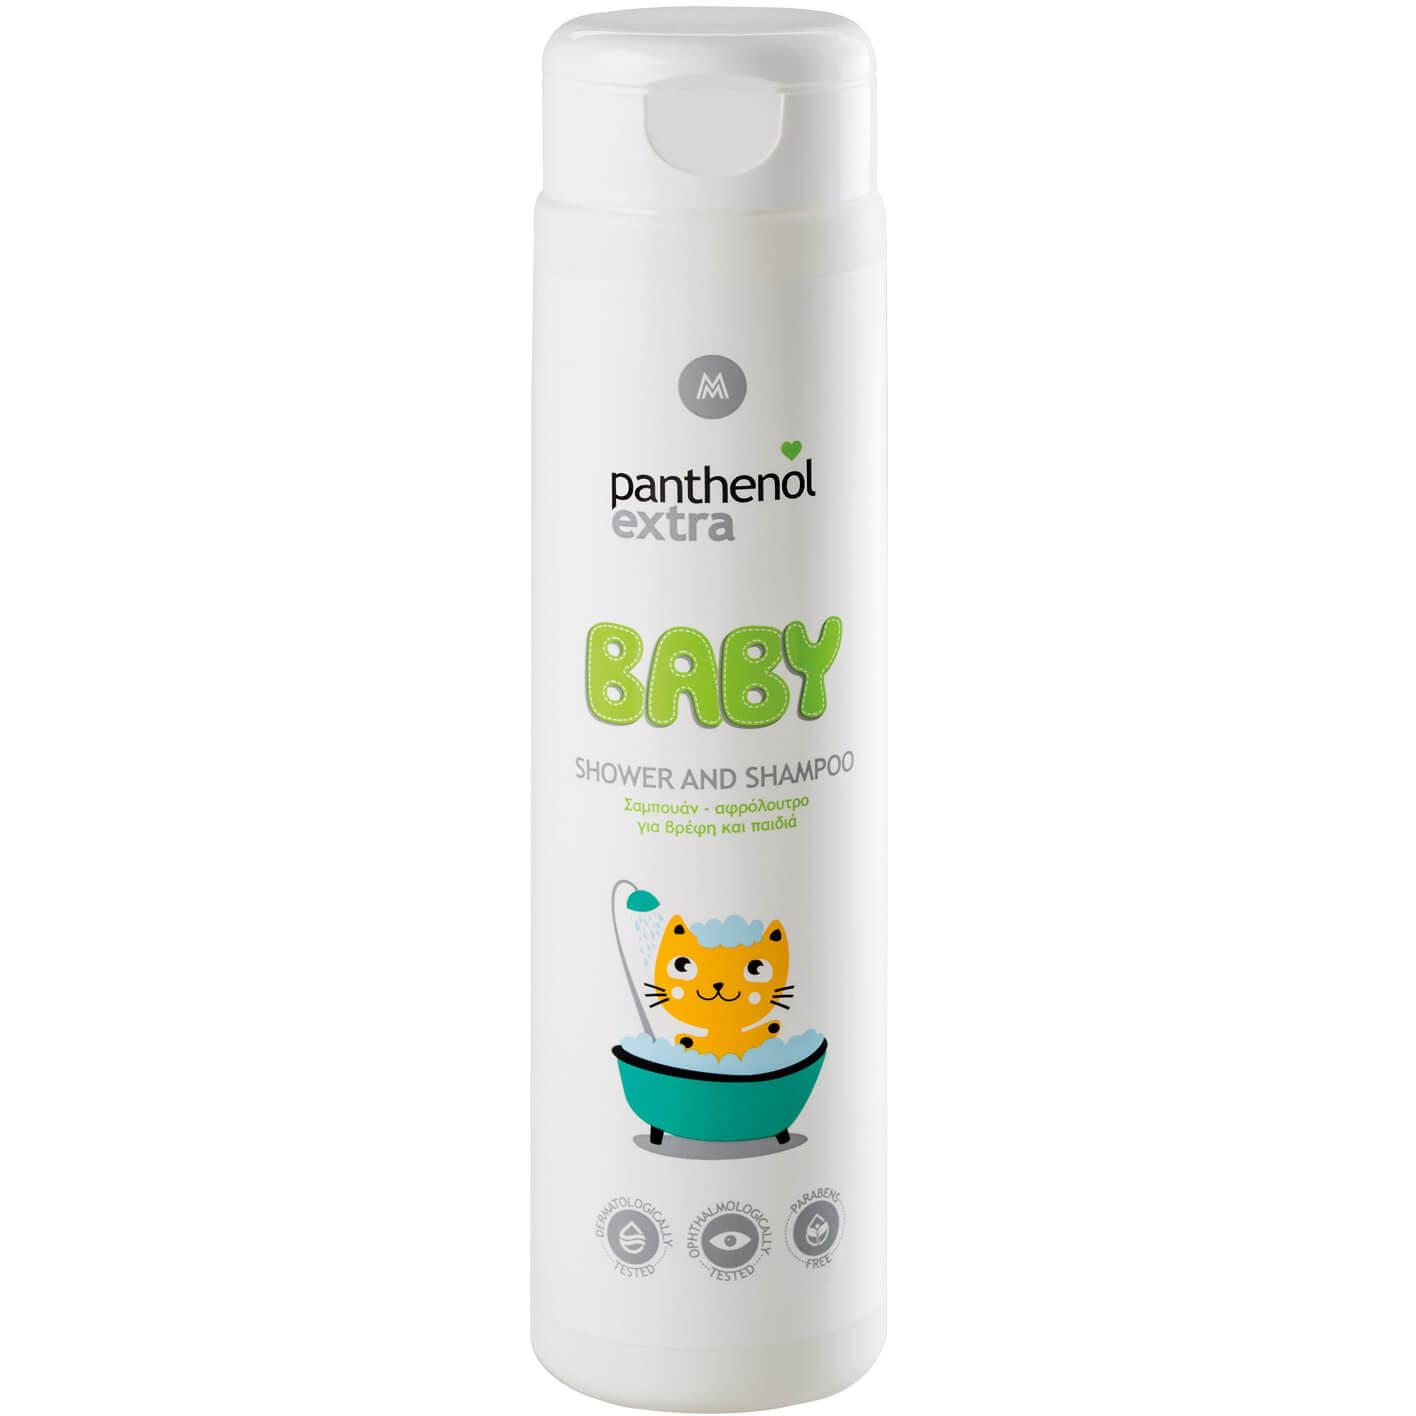 Panthenol Extra Baby Shower & Shampoo Σαμπουάν – Αφρόλουτρο για Βρέφη & Παιδιά 300ml